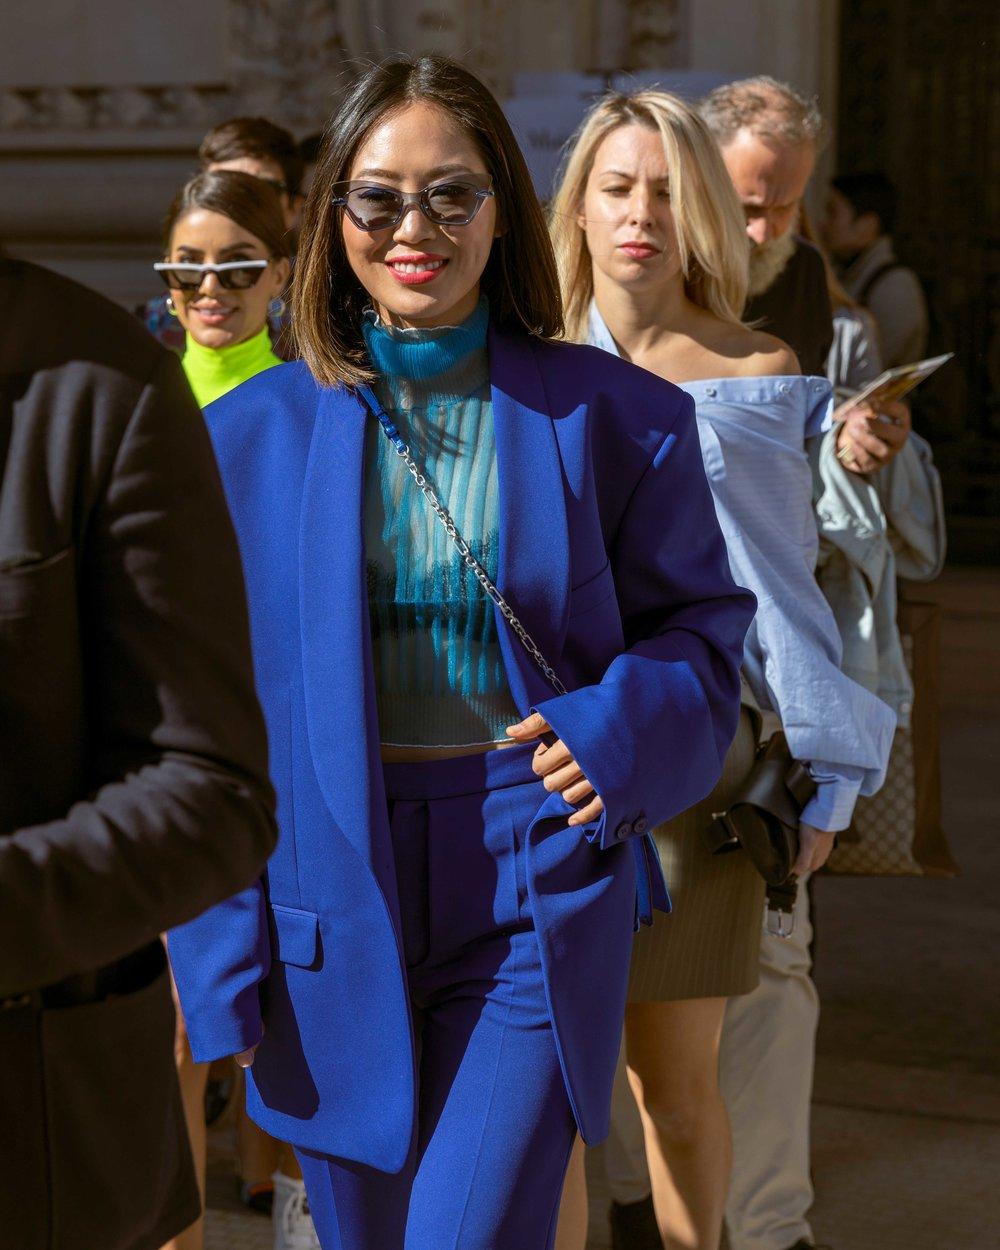 Paris-Fashion-Week-Spring-2019-September-2018_by_Alexis_Breugelmans_002.jpg